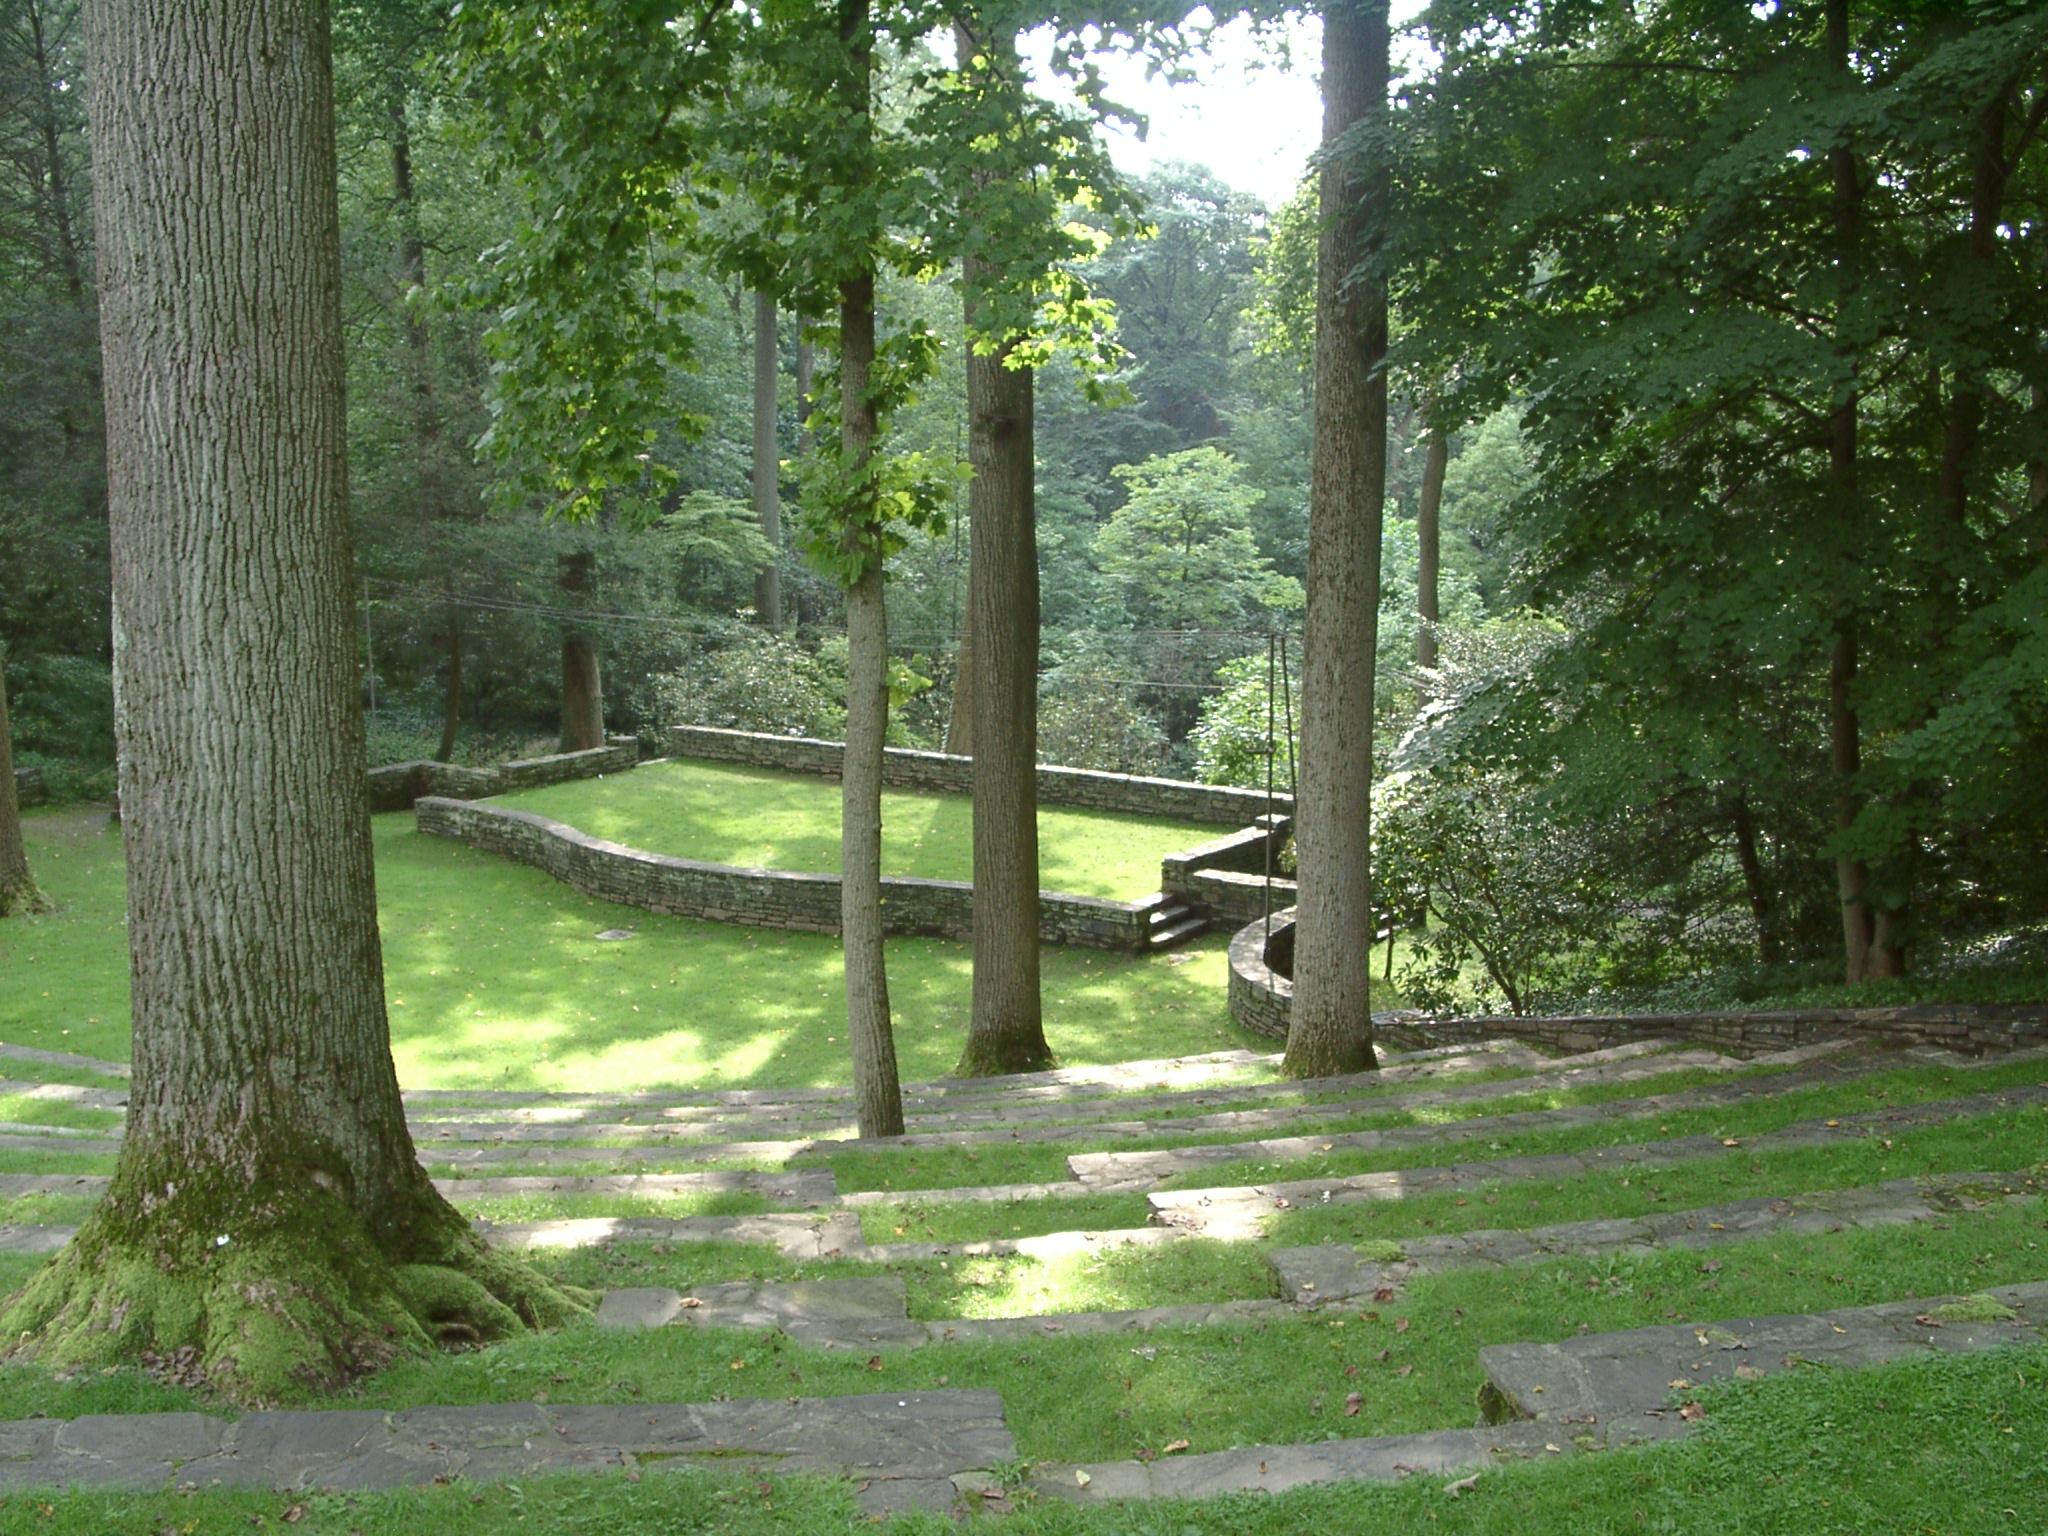 Scott Outdoor Amphitheater Arslocii Placeness As Art